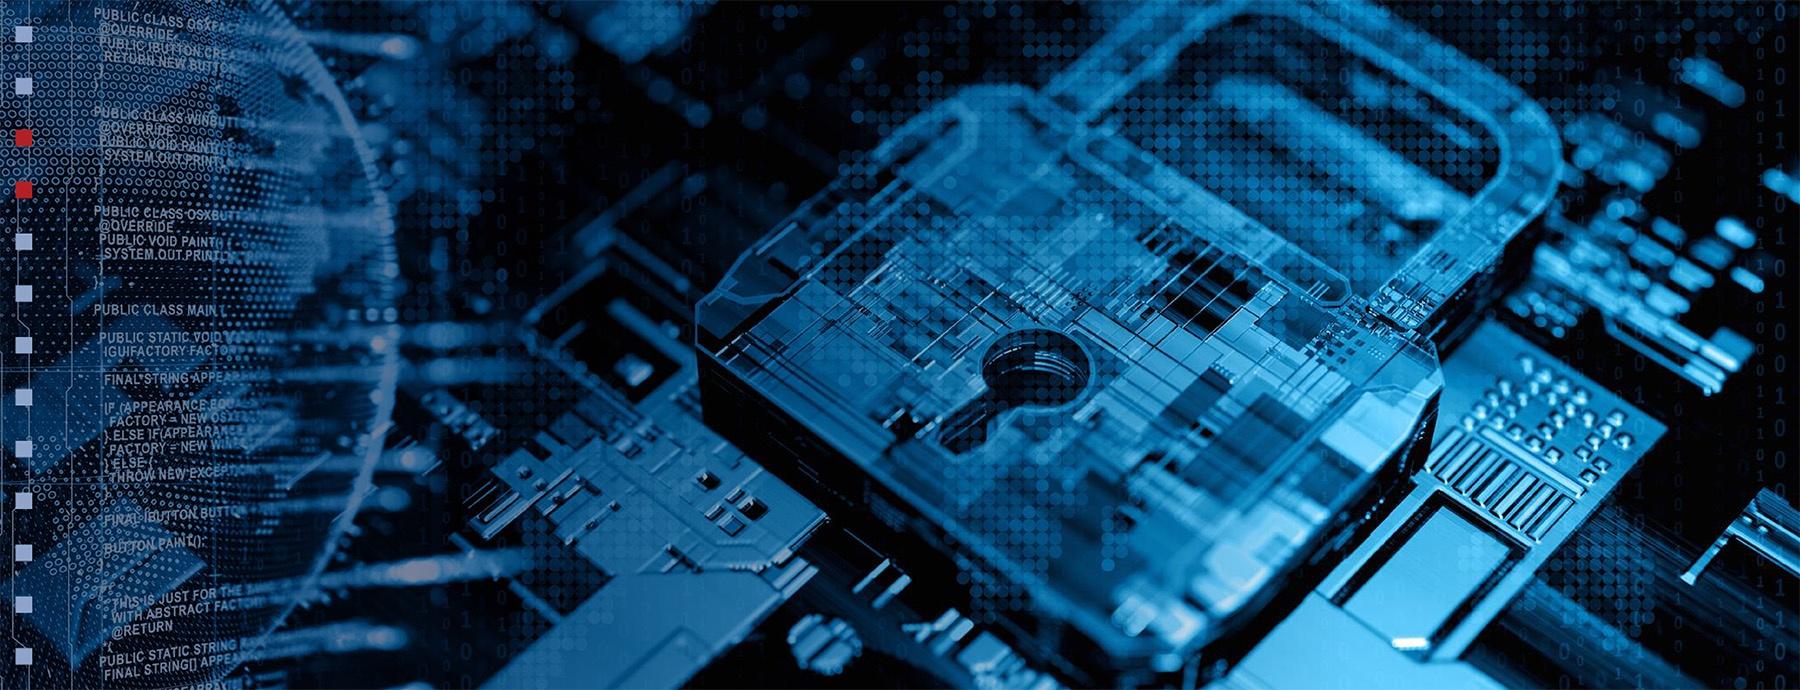 Data Disclose and Data Redact